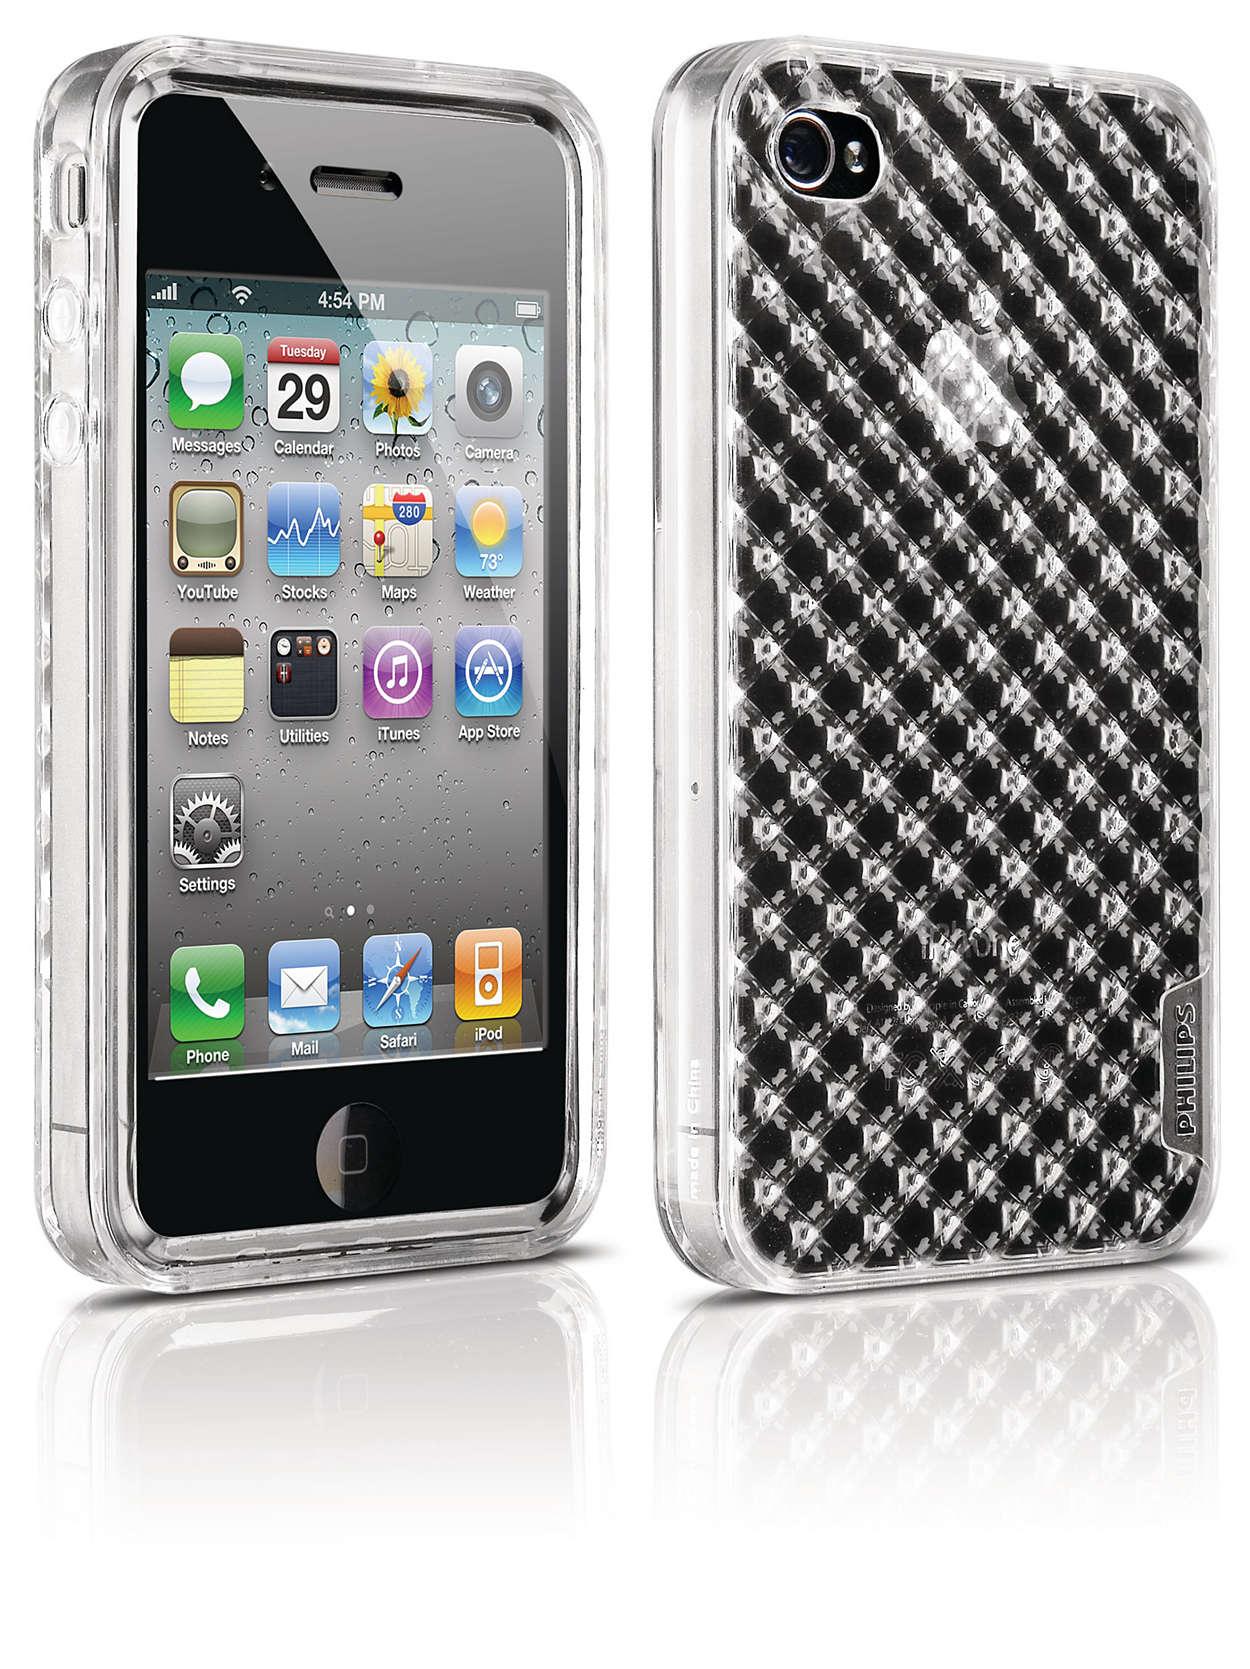 Protege tu iPhone con una funda flexible